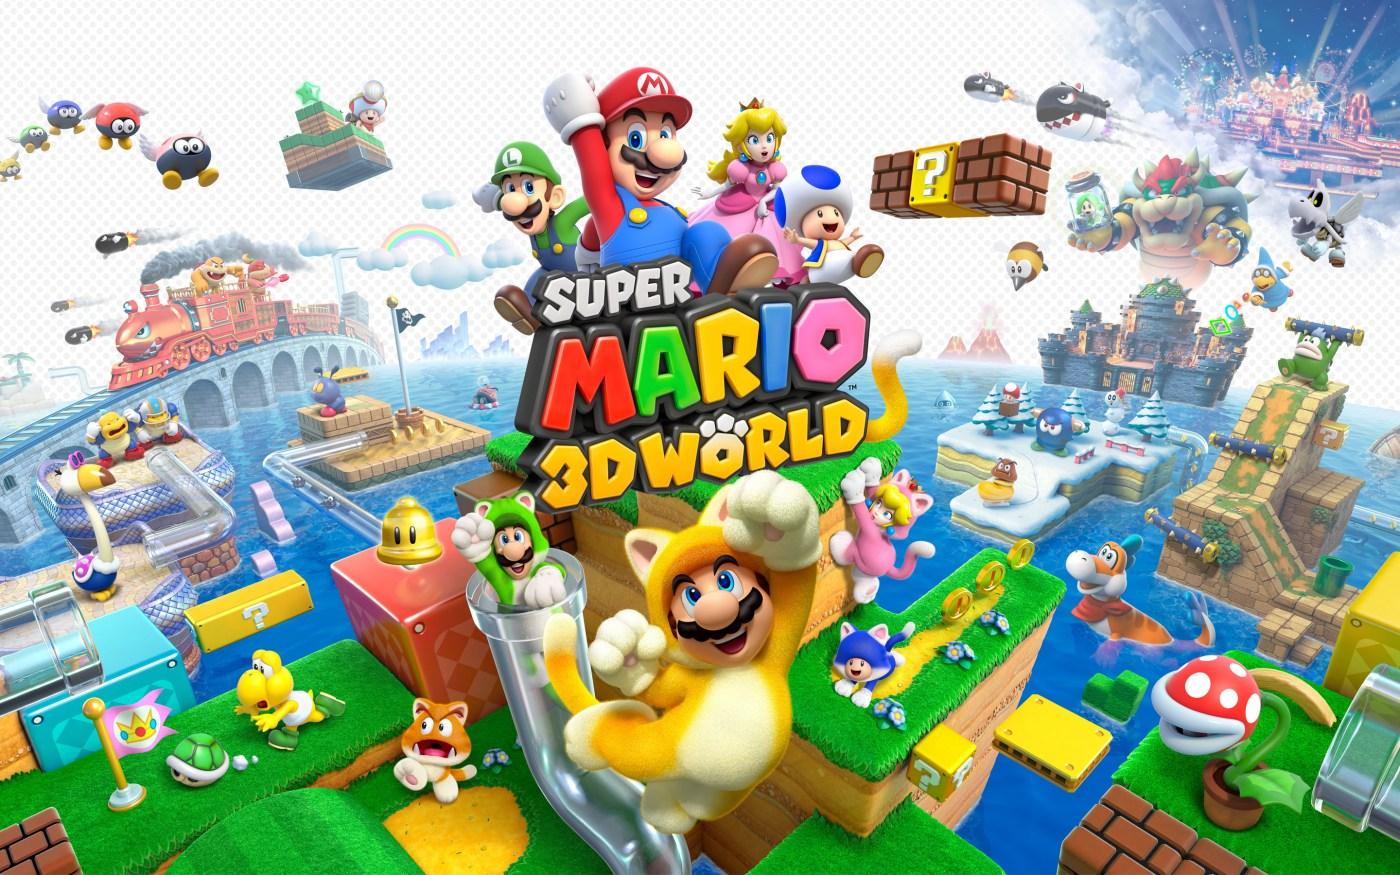 2) Super Mario 3D World